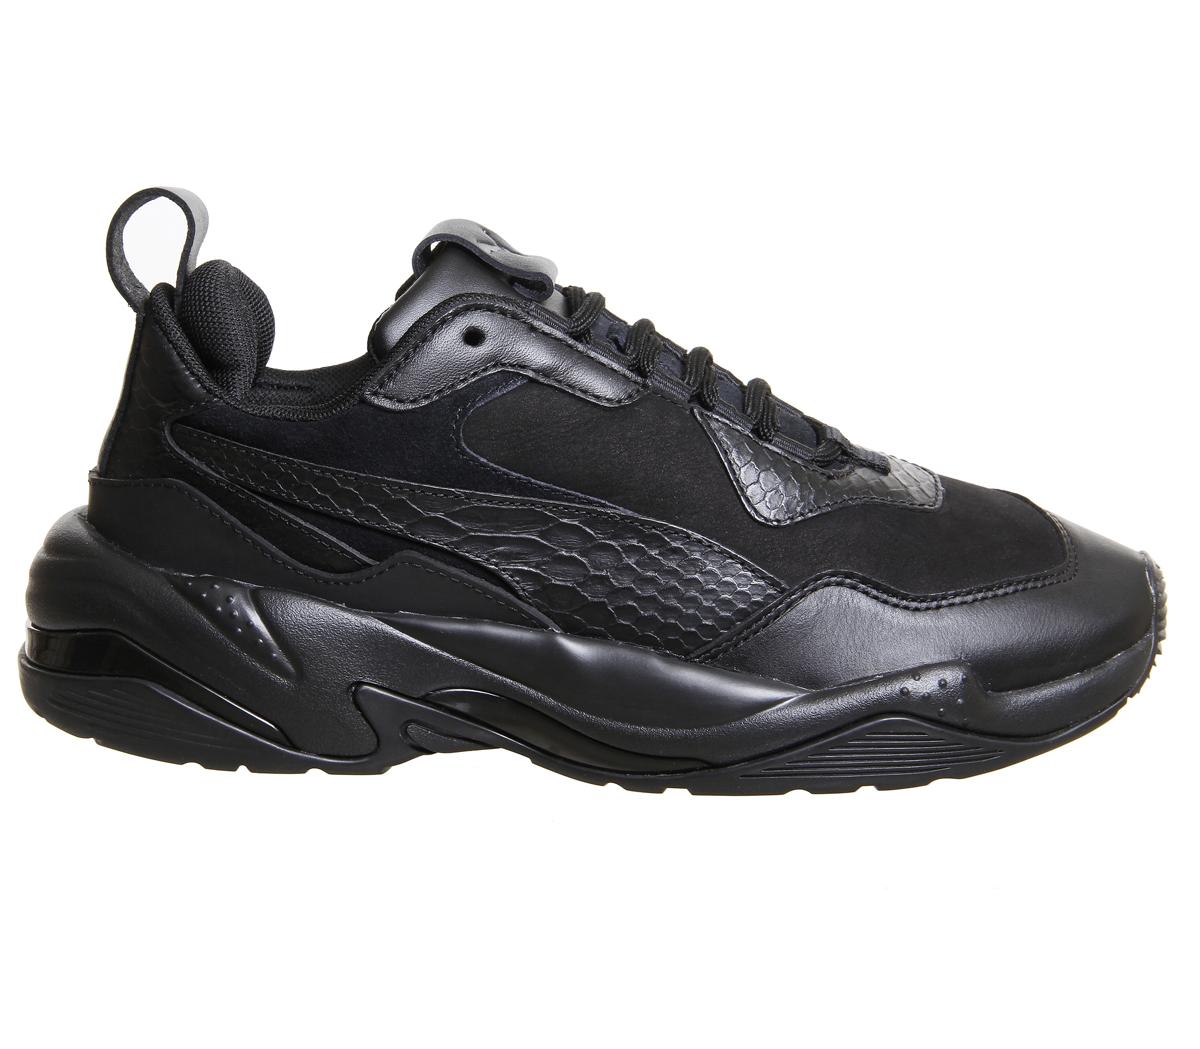 Puma Thunder Desert Trainers Trainers PUMA BLACK Trainers Trainers Shoes adff04